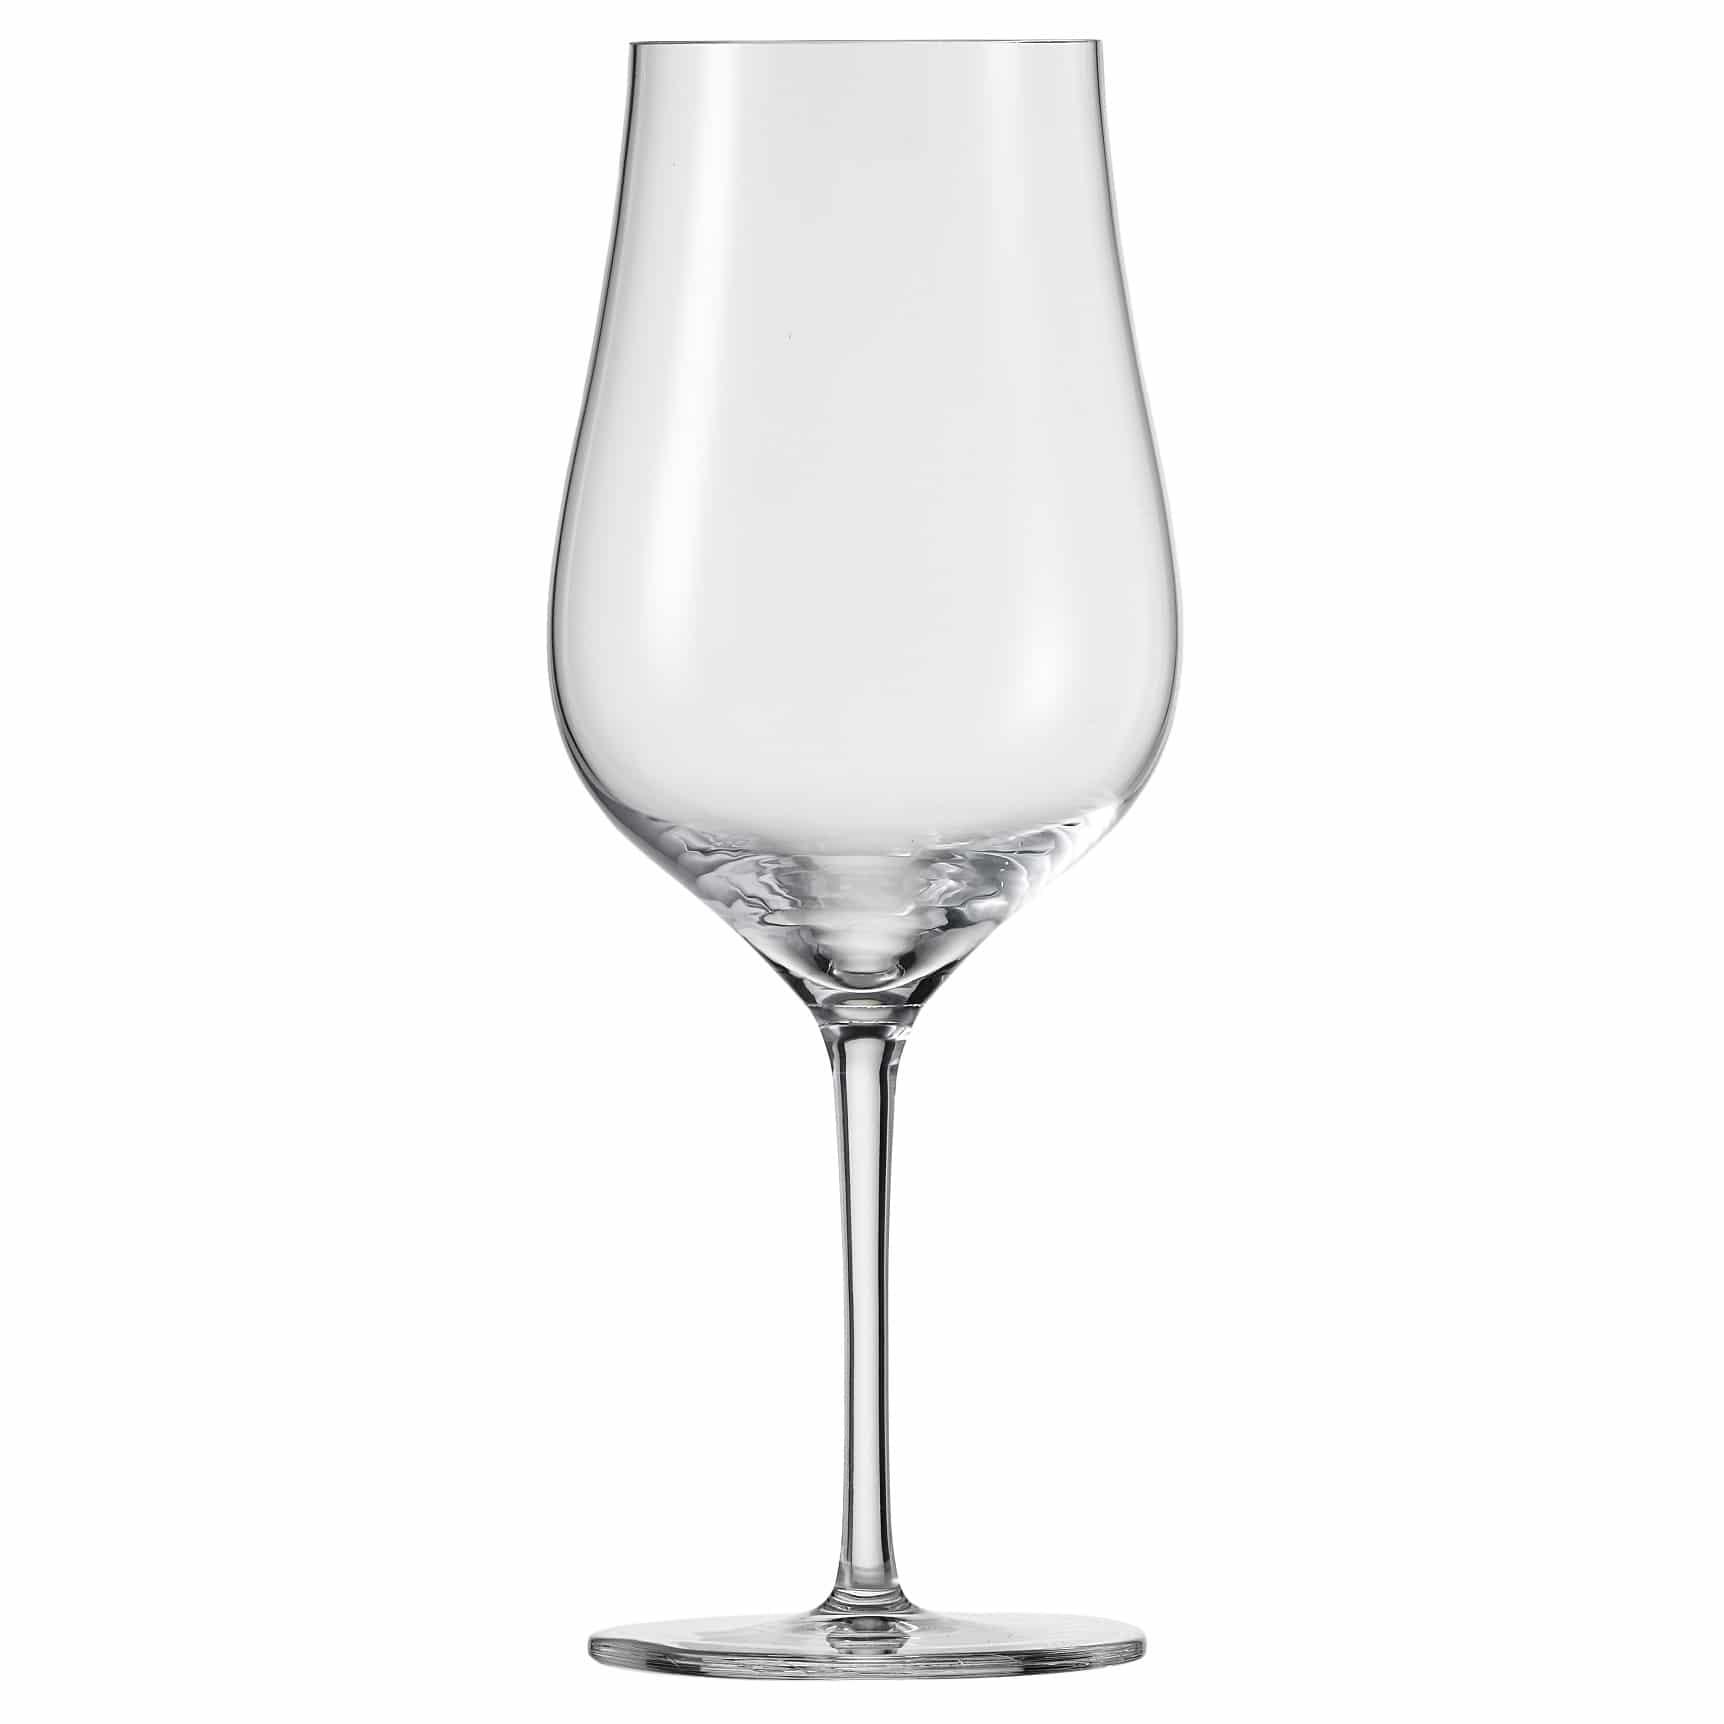 Schott Zwiesel Tritan Crystal Concerto Red Wine Glass